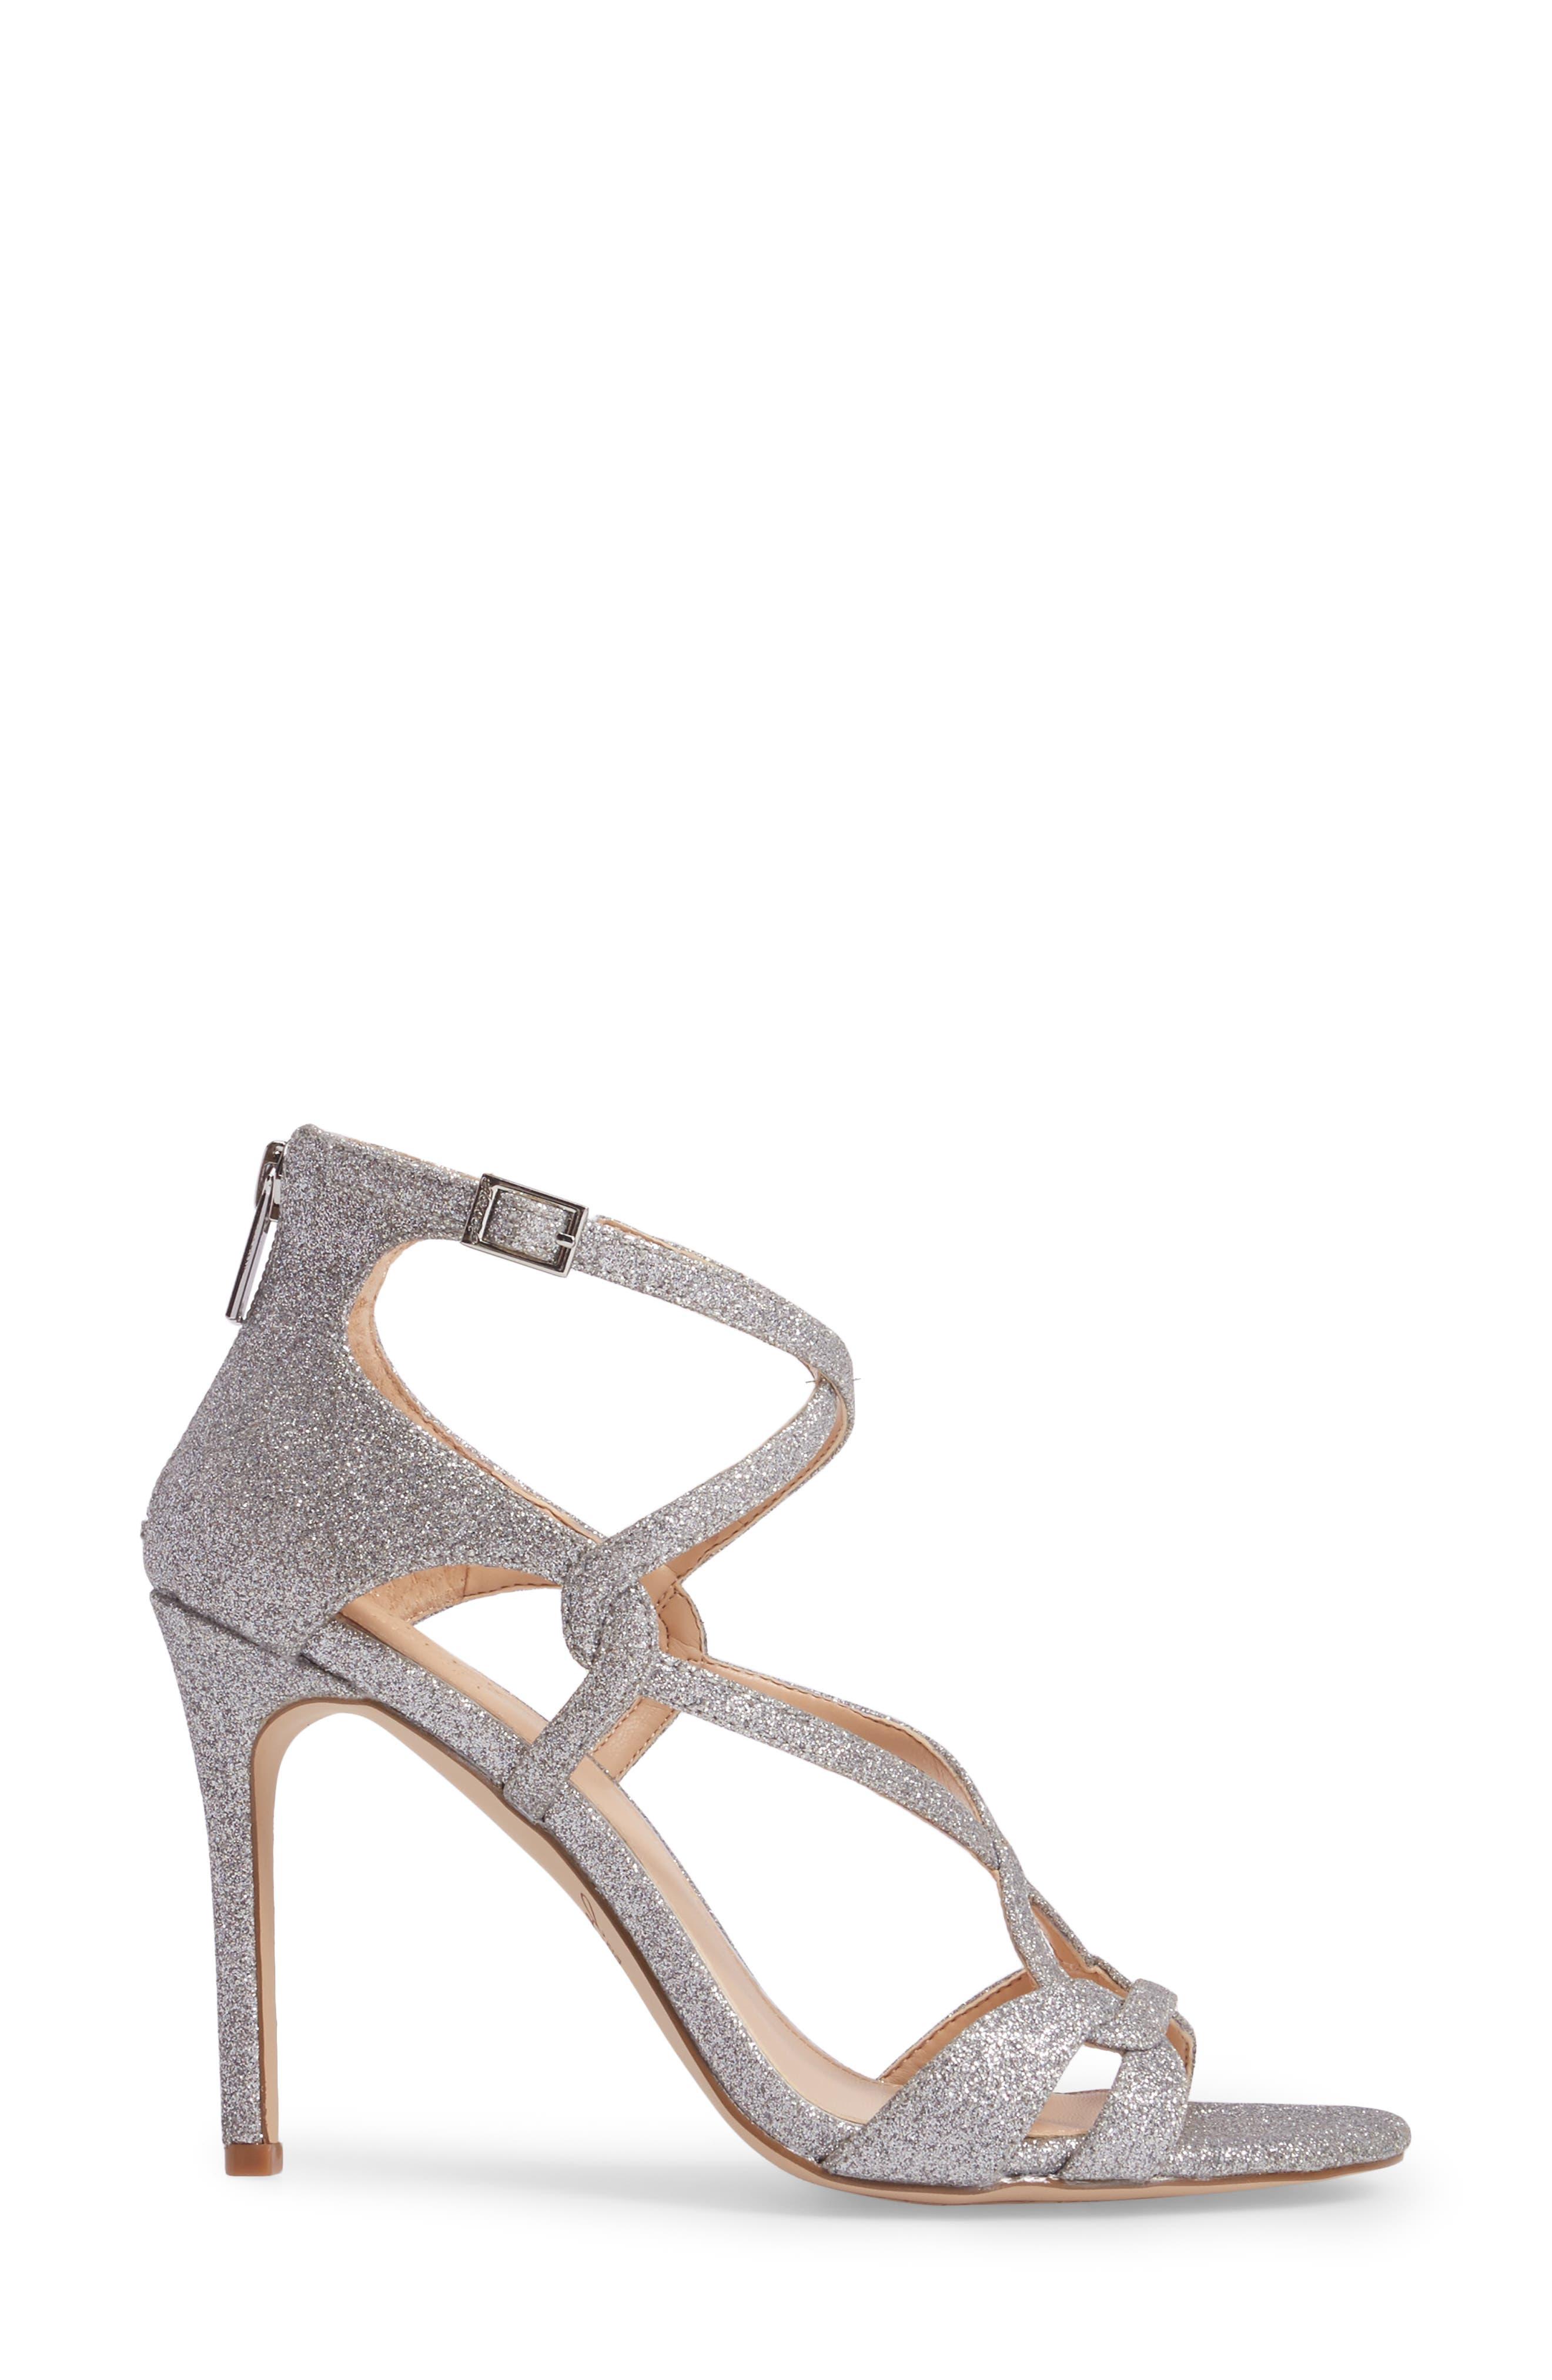 Aliza Strappy Glitter Sandal,                             Alternate thumbnail 3, color,                             043